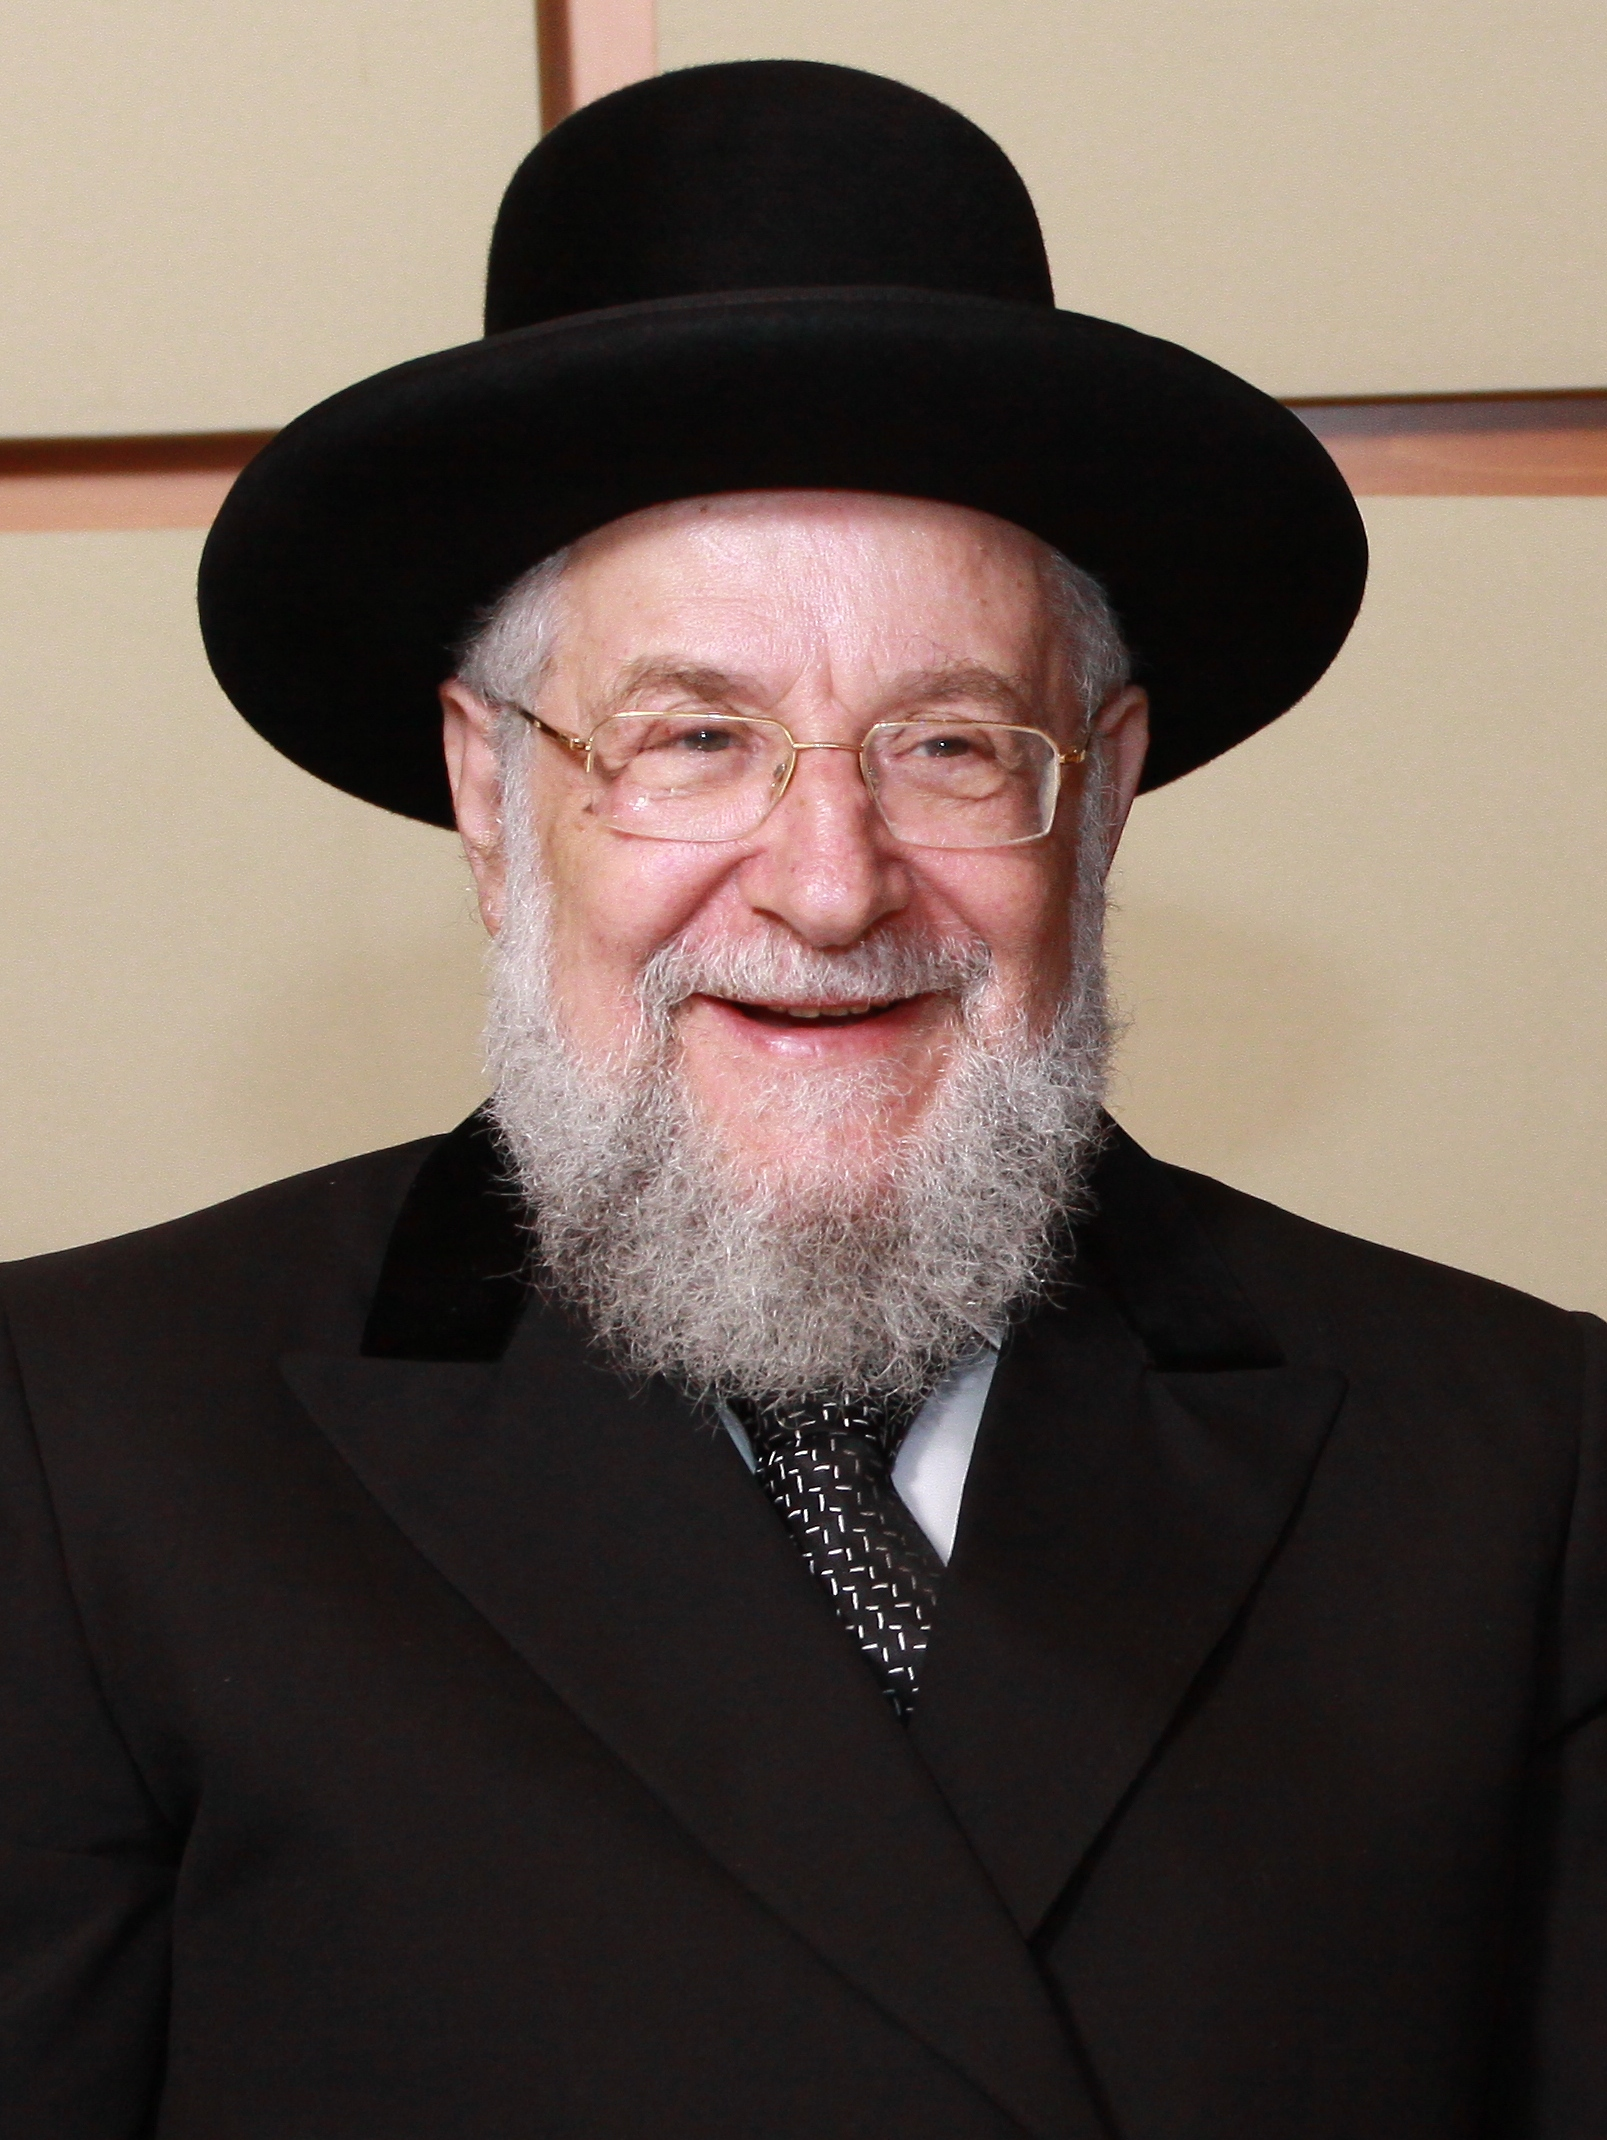 http://www.70for70.com/wp-content/uploads/2015/03/chief-rabbi-lau.jpg